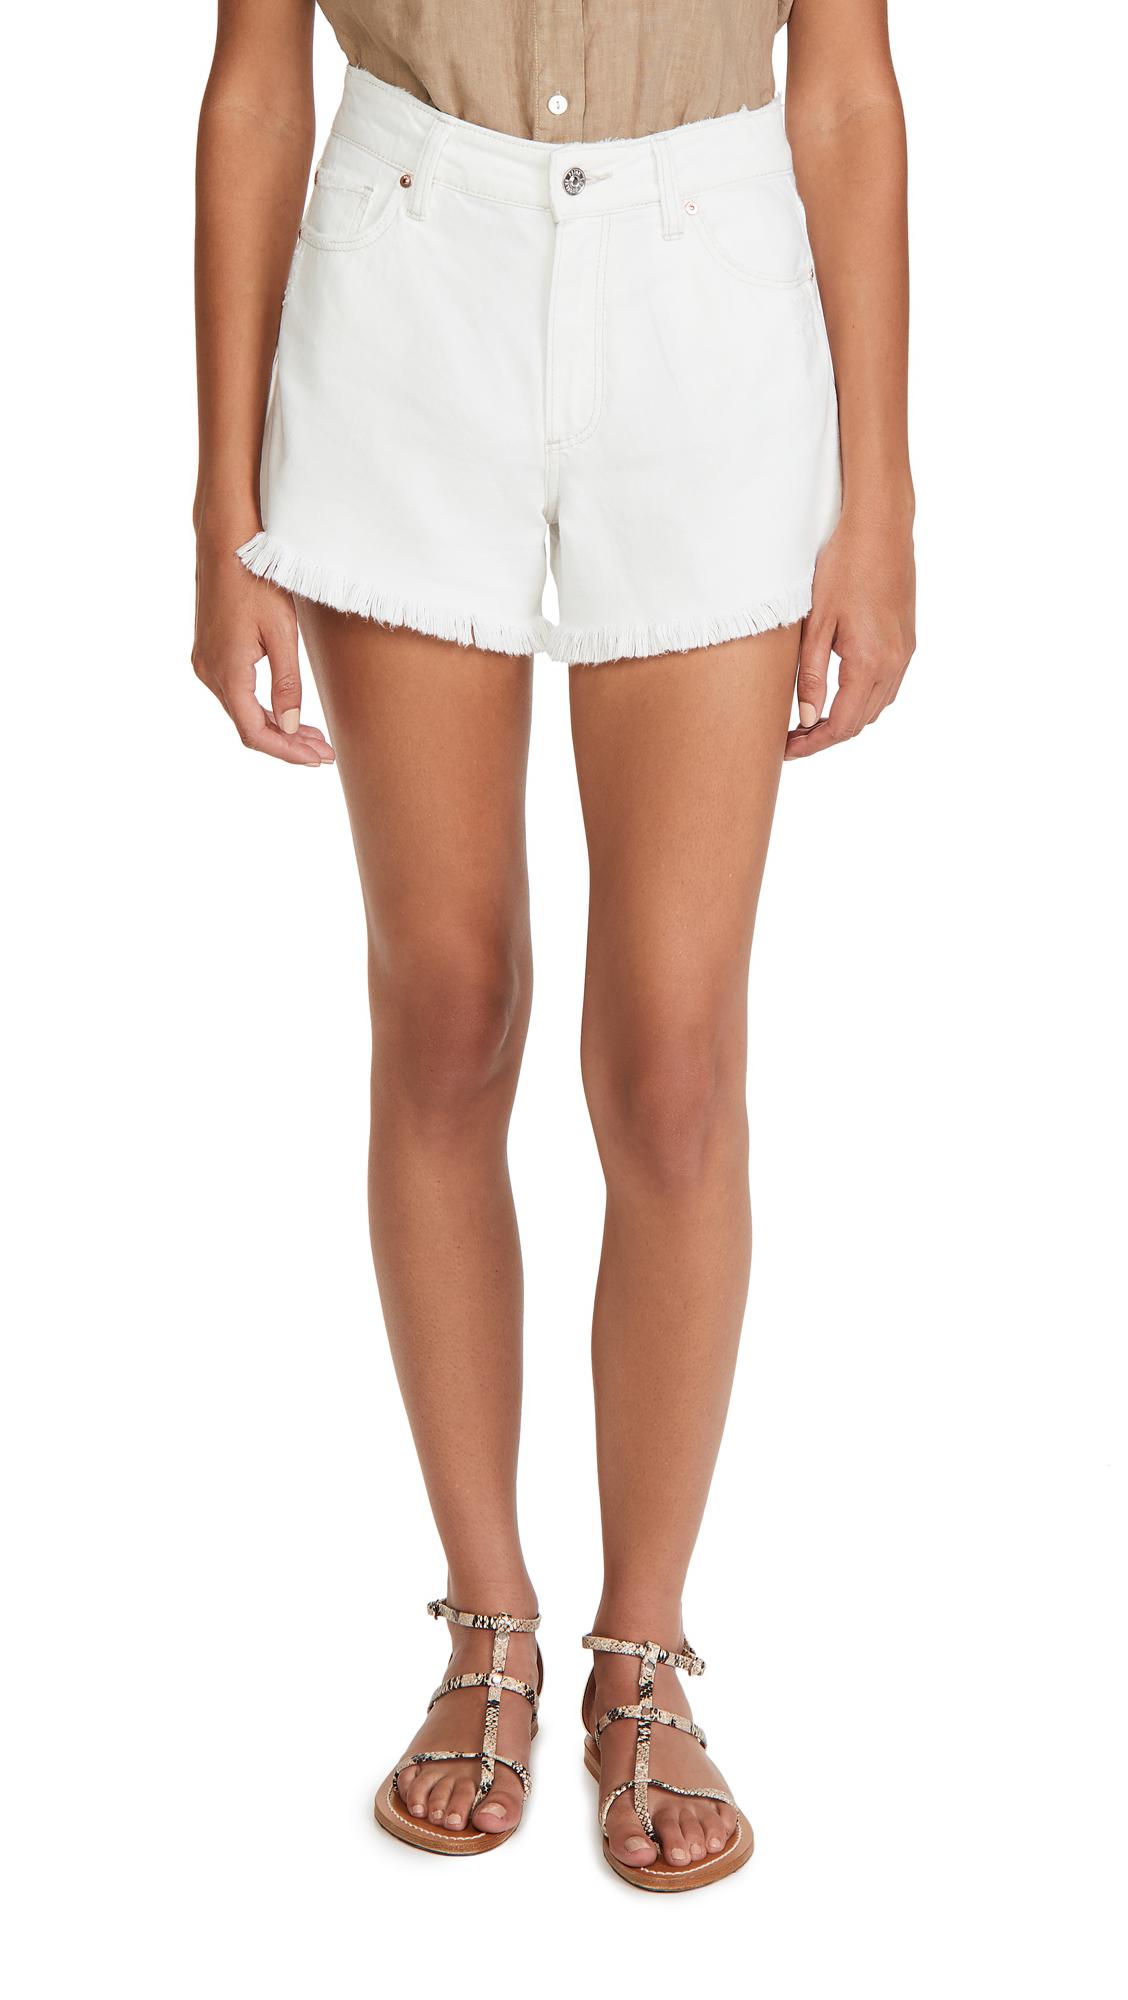 PAIGE Noella Cut Off Shorts